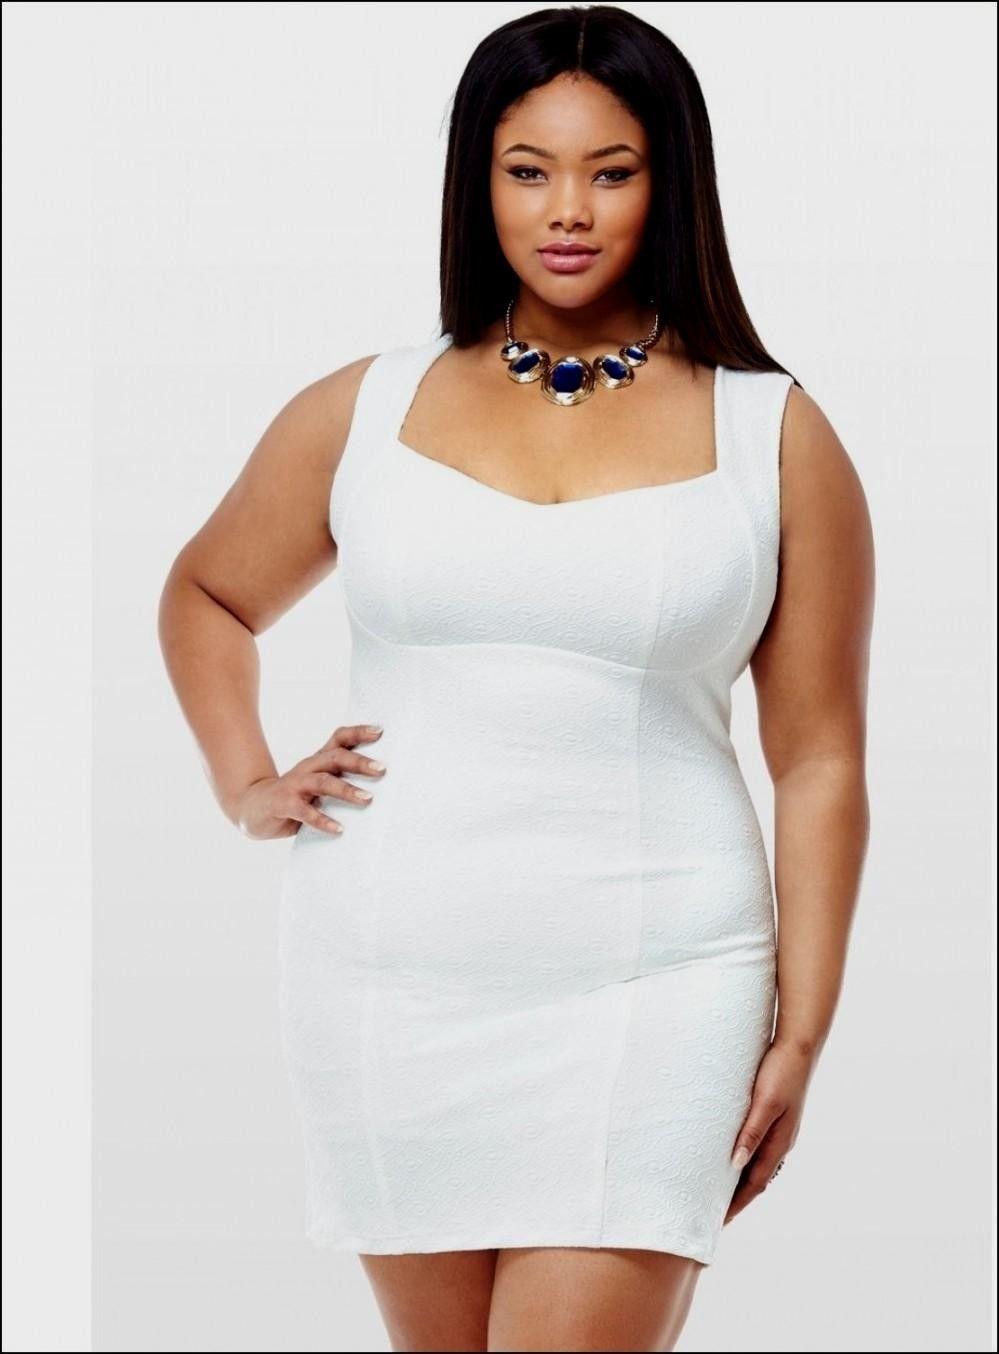 White bodycon dress plus size World dresses | Big Beautiful Women ...